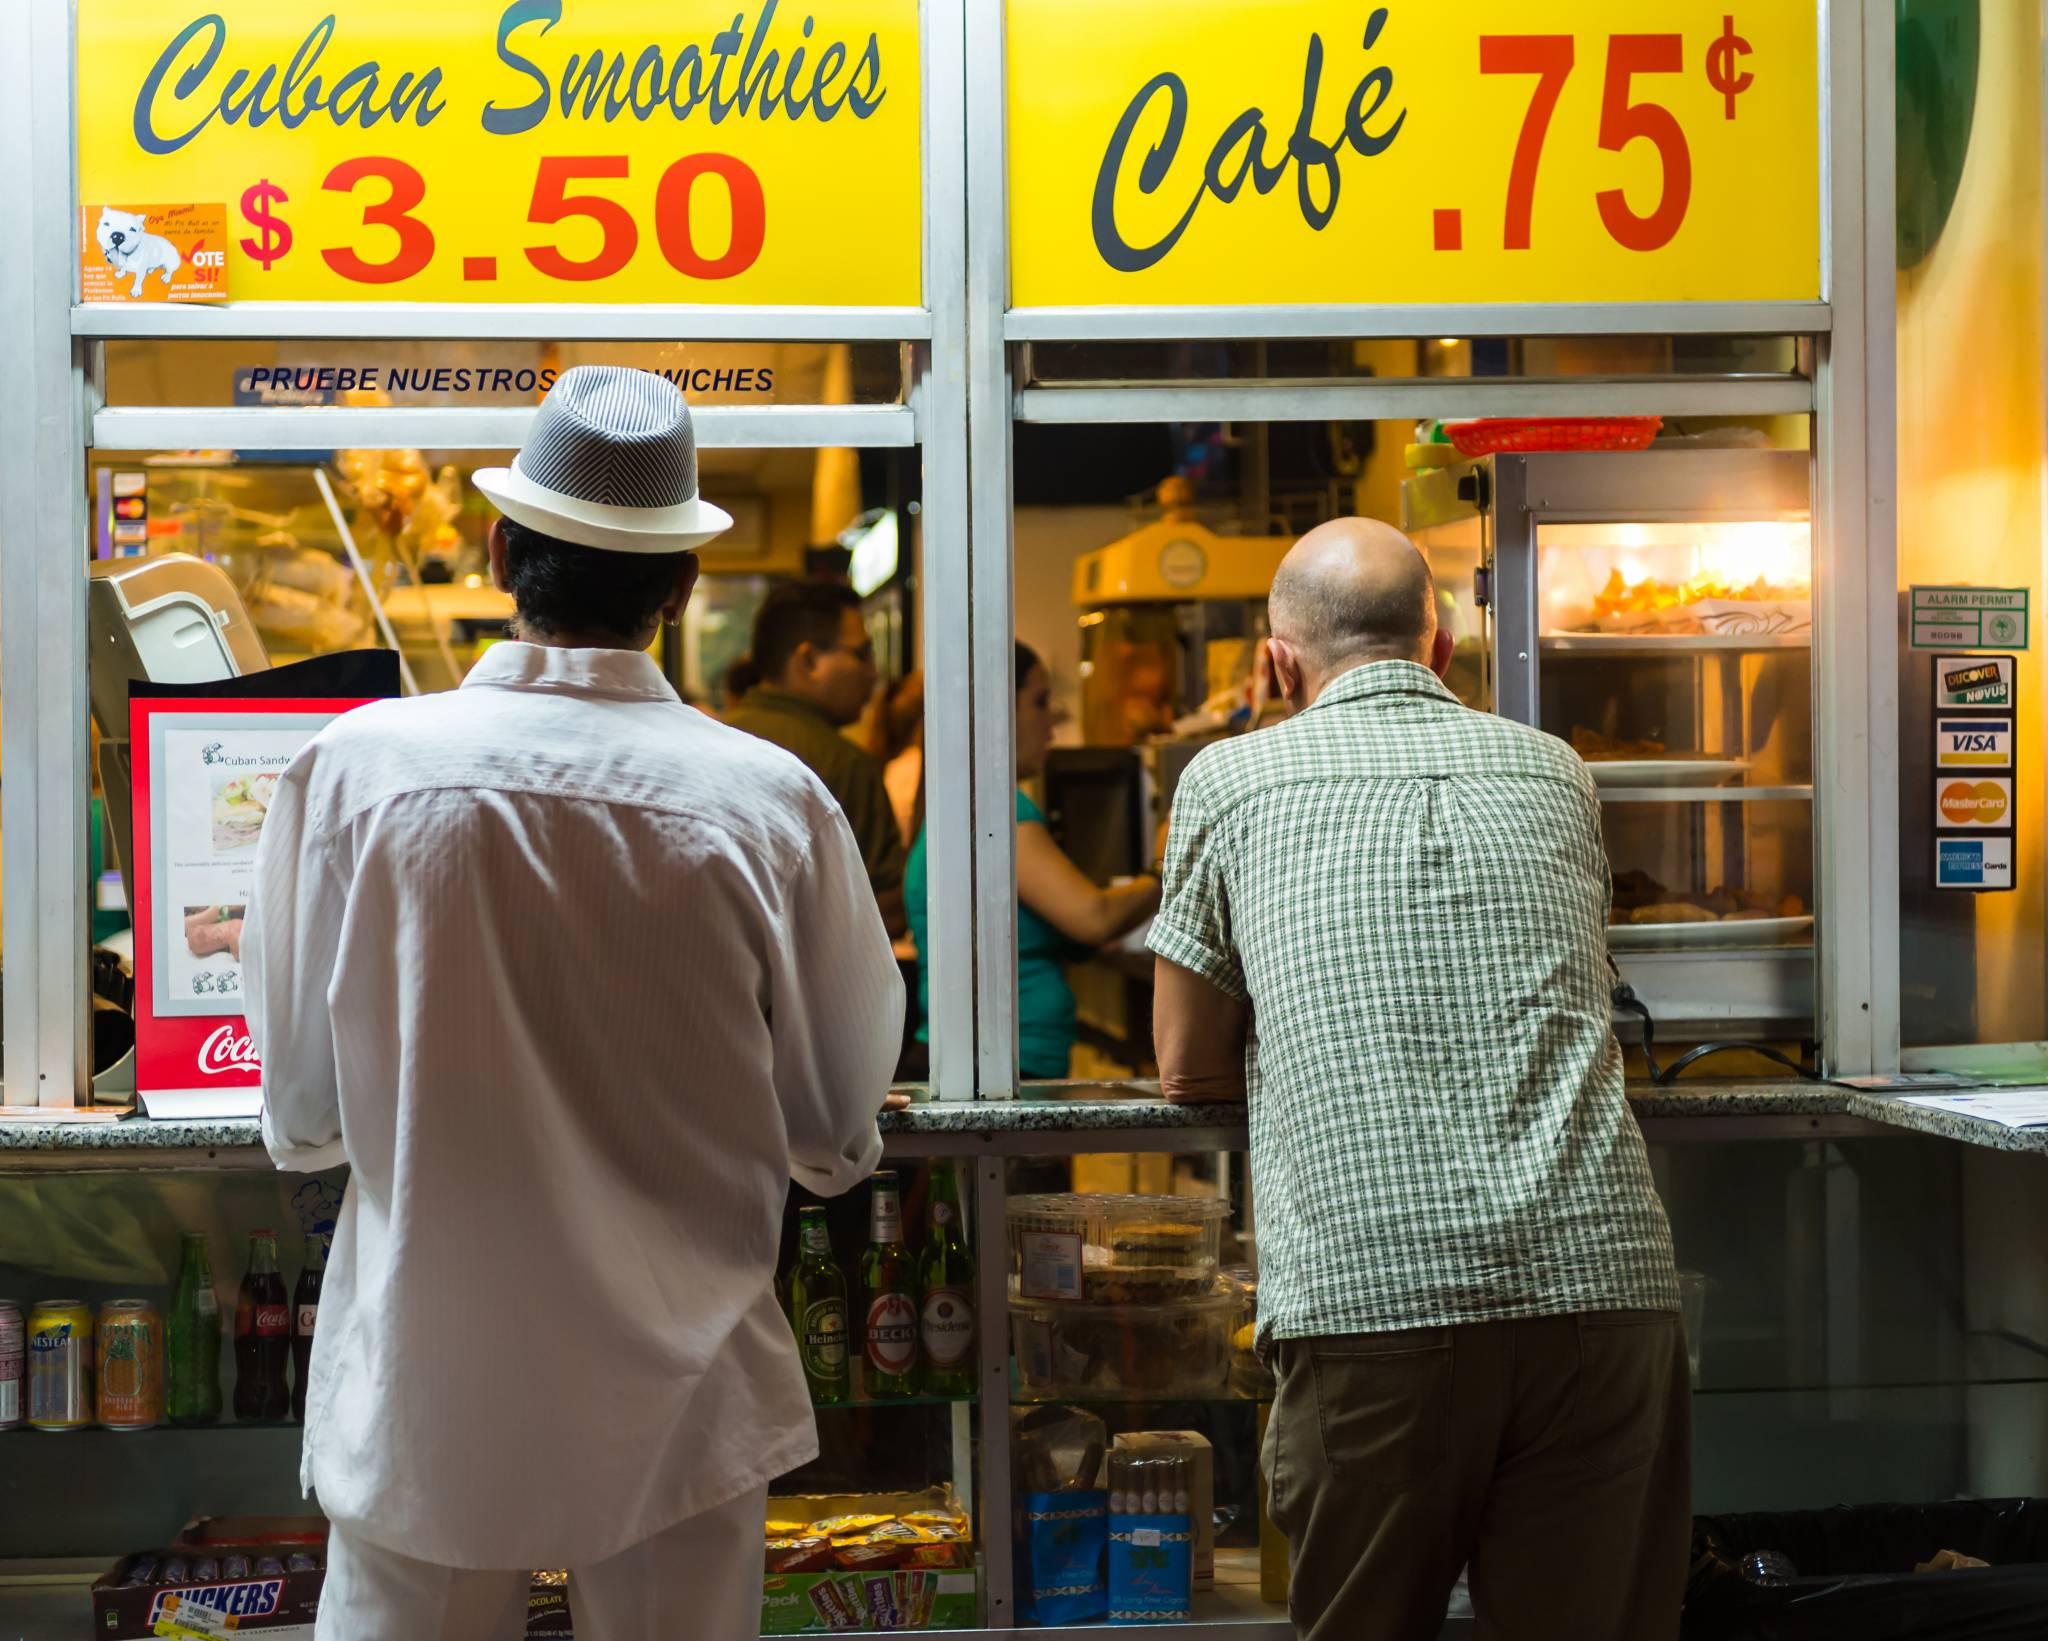 Miami amazing cultural diversity